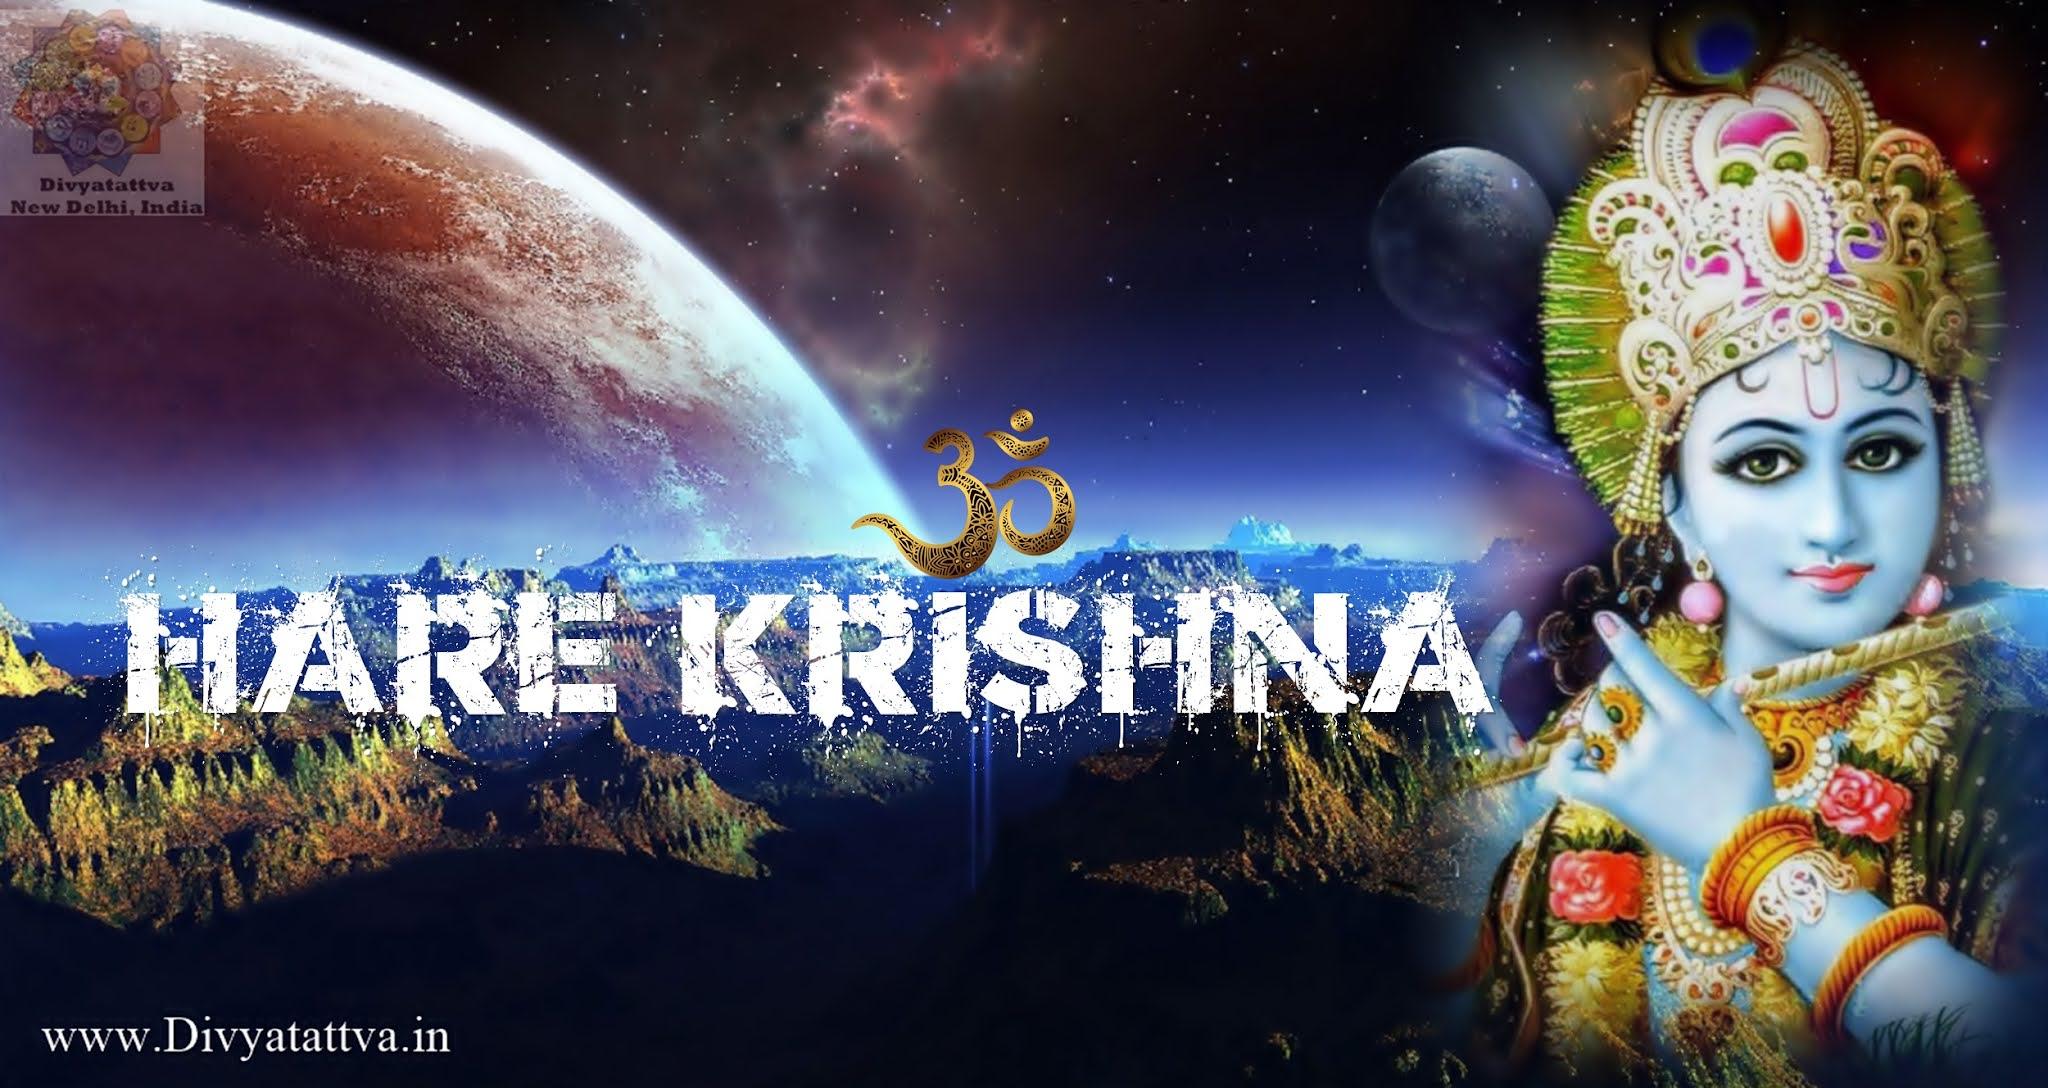 Happy janmashtami, Hindu festival janmashtami images, krishna janmashtami. ... DP wallpapers and whatsapp images Krishna, Wallpaper, .